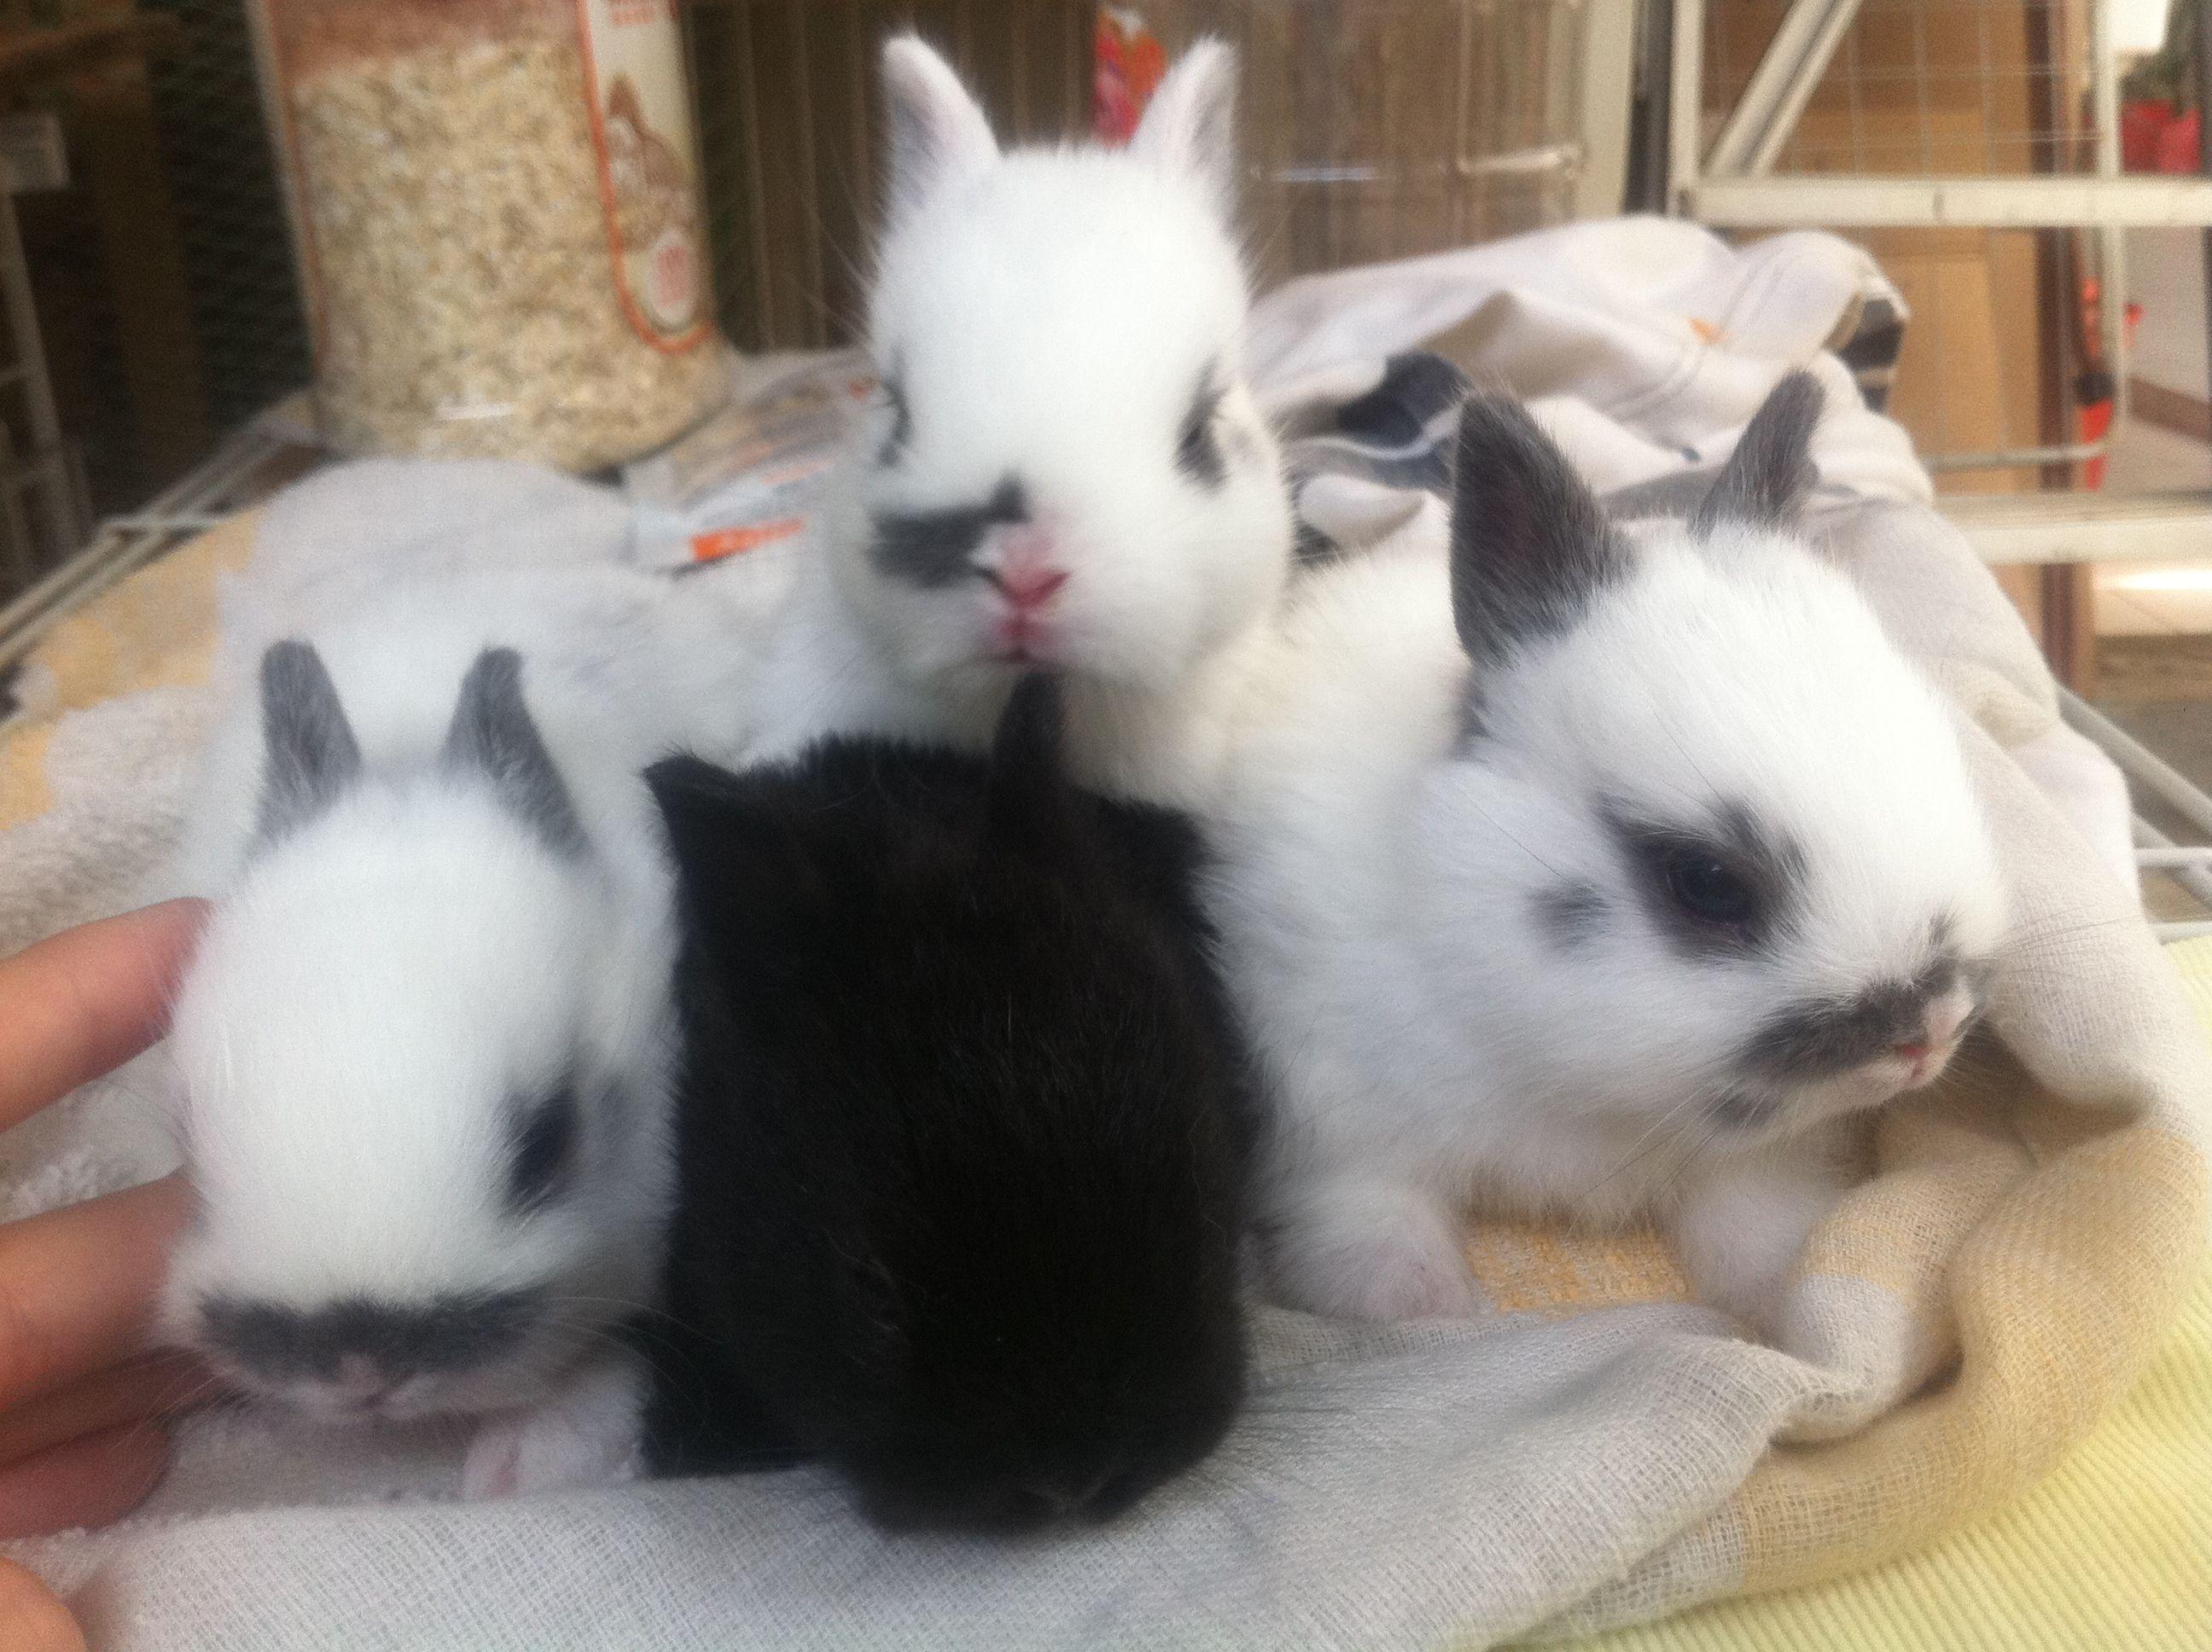 For Sale Adoption Baby Hotot Netherland Dwarf Rabbits Netherland Dwarf Dwarf Rabbit Dwarf Bunnies